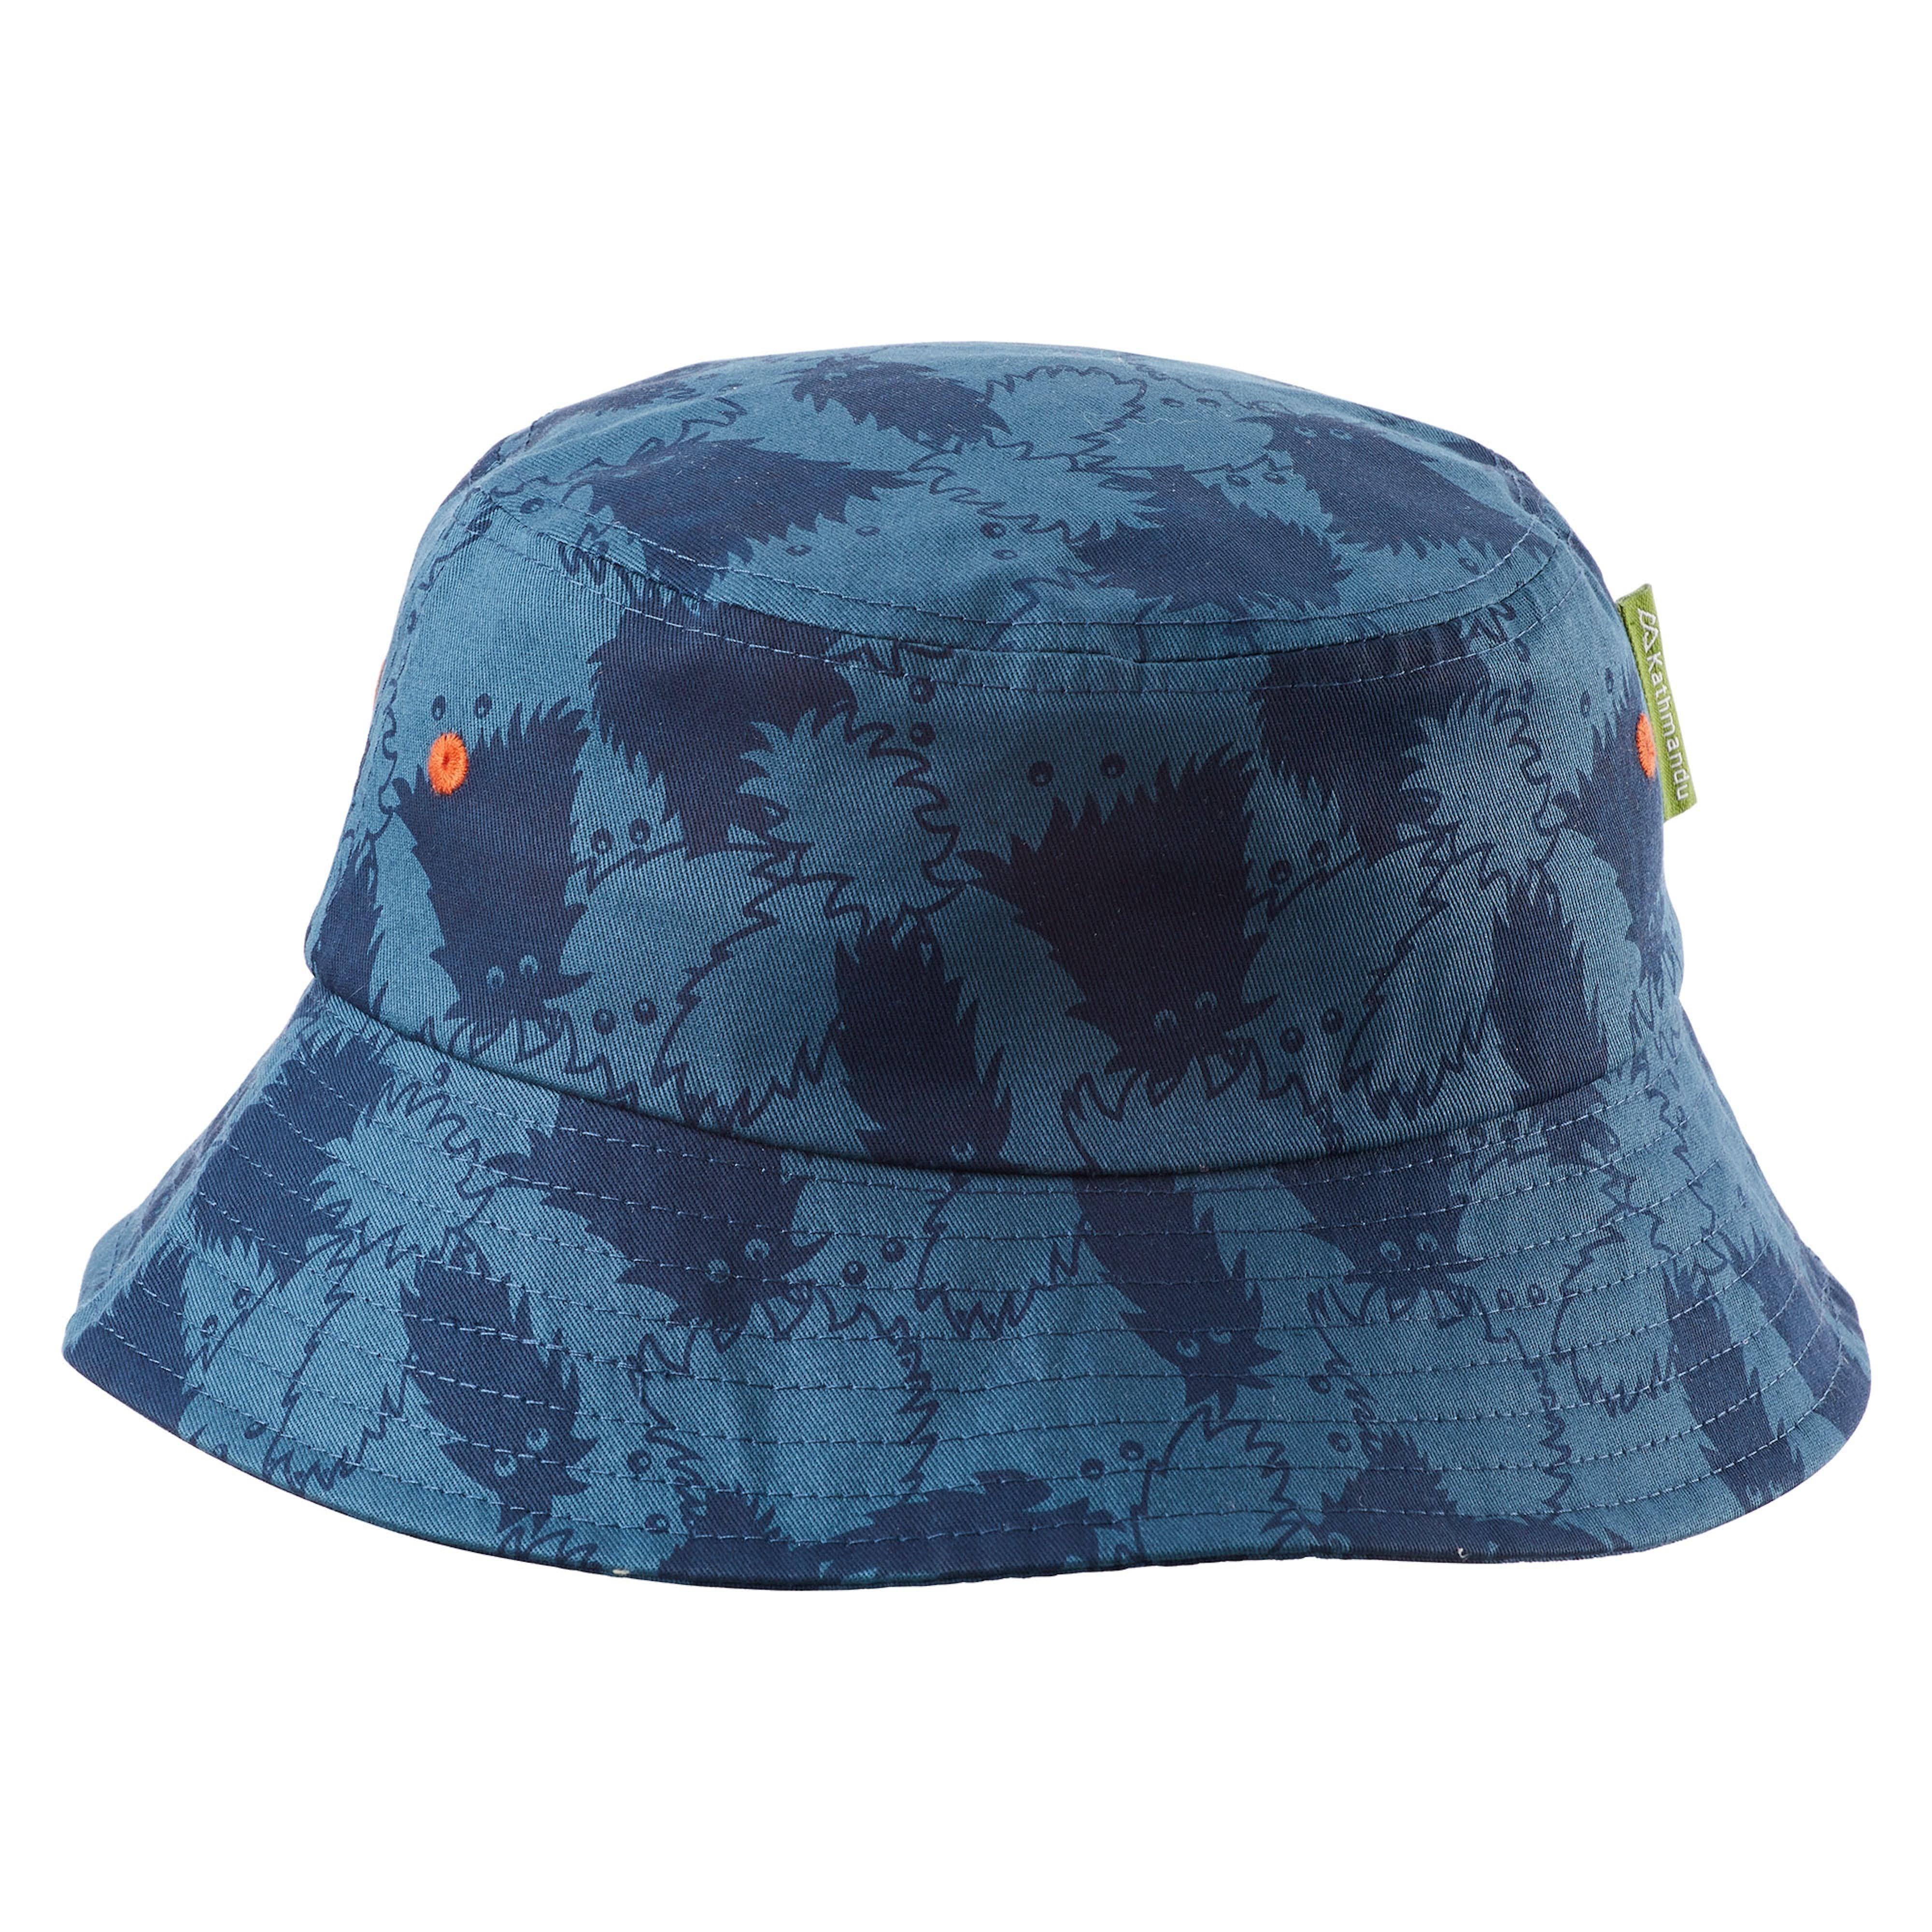 eefd3a2c Kids Hats: Beanie, Cap, Scarf for Boys & Girls | Kathmandu AU